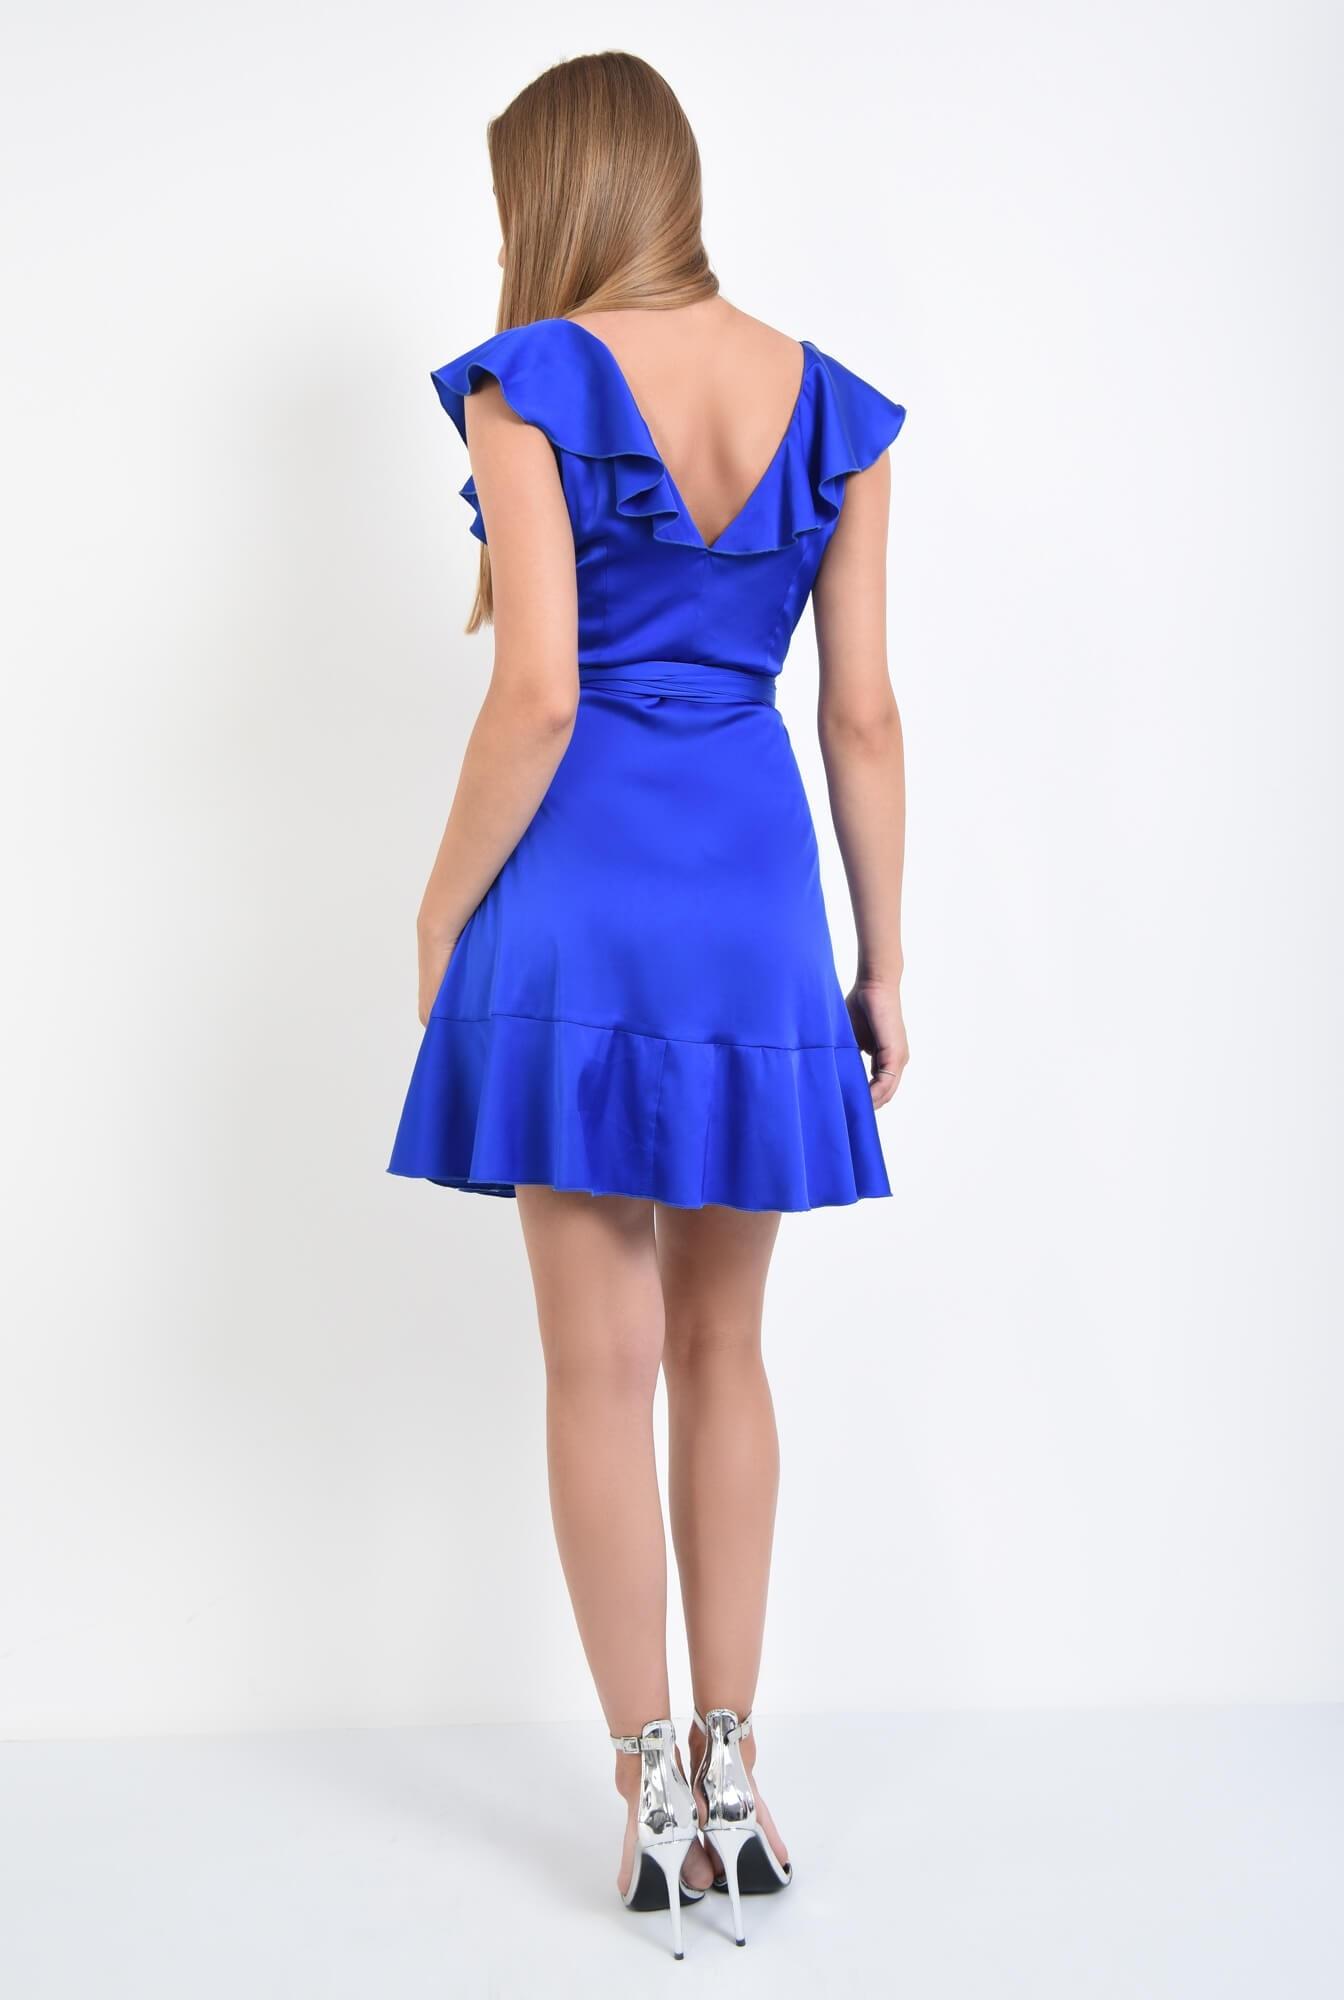 1 - rochie de seara, scurta, albastru, electric, volane, cordon